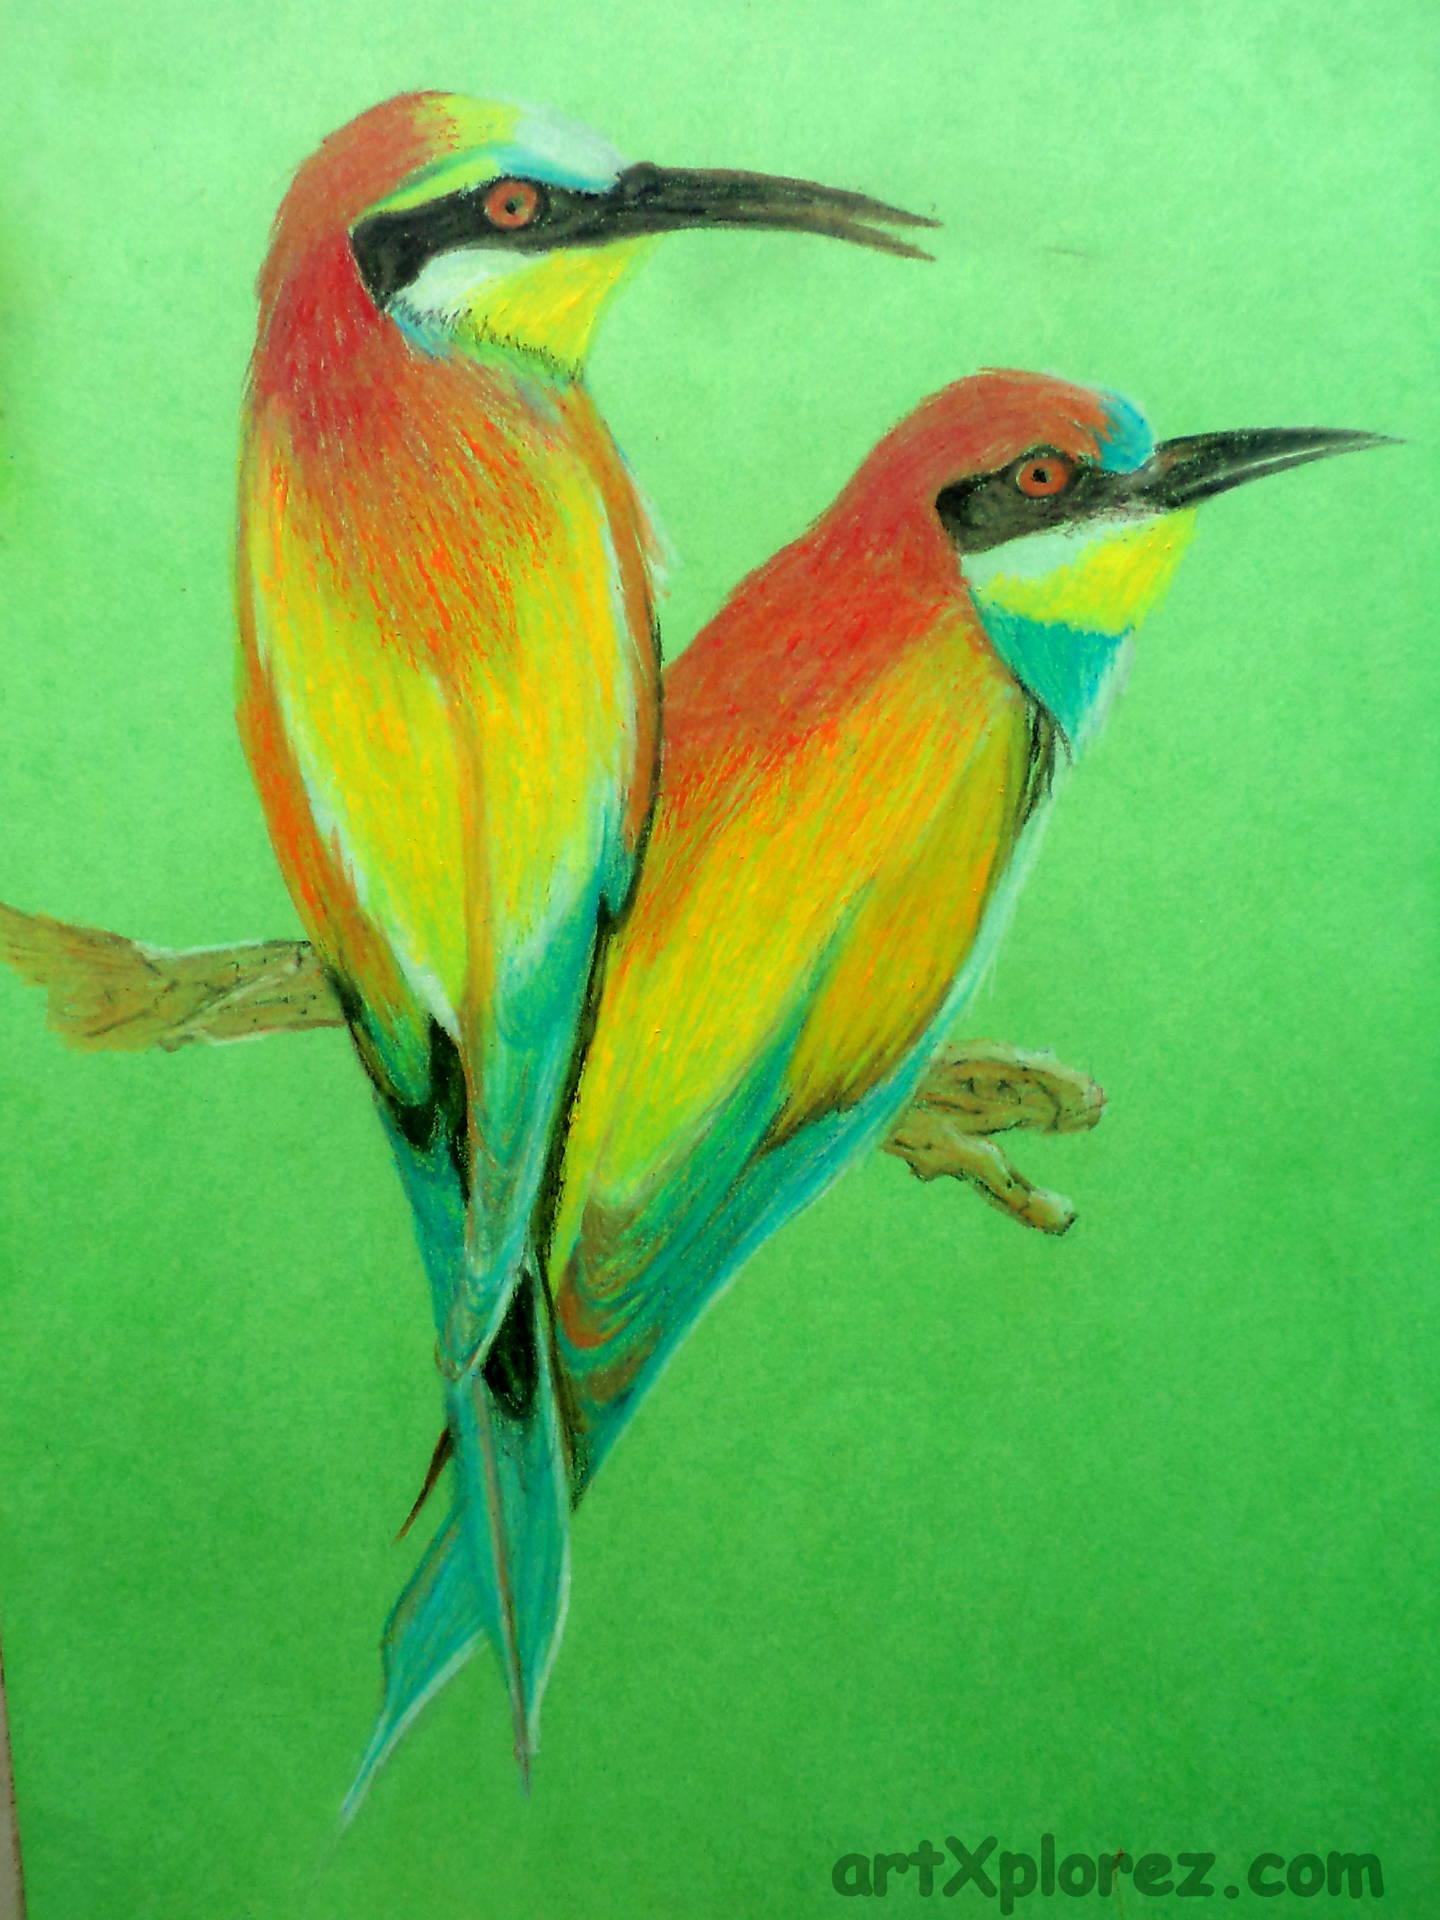 1440x1920 Drawing Birds Using Oil Pastels Artxplorez